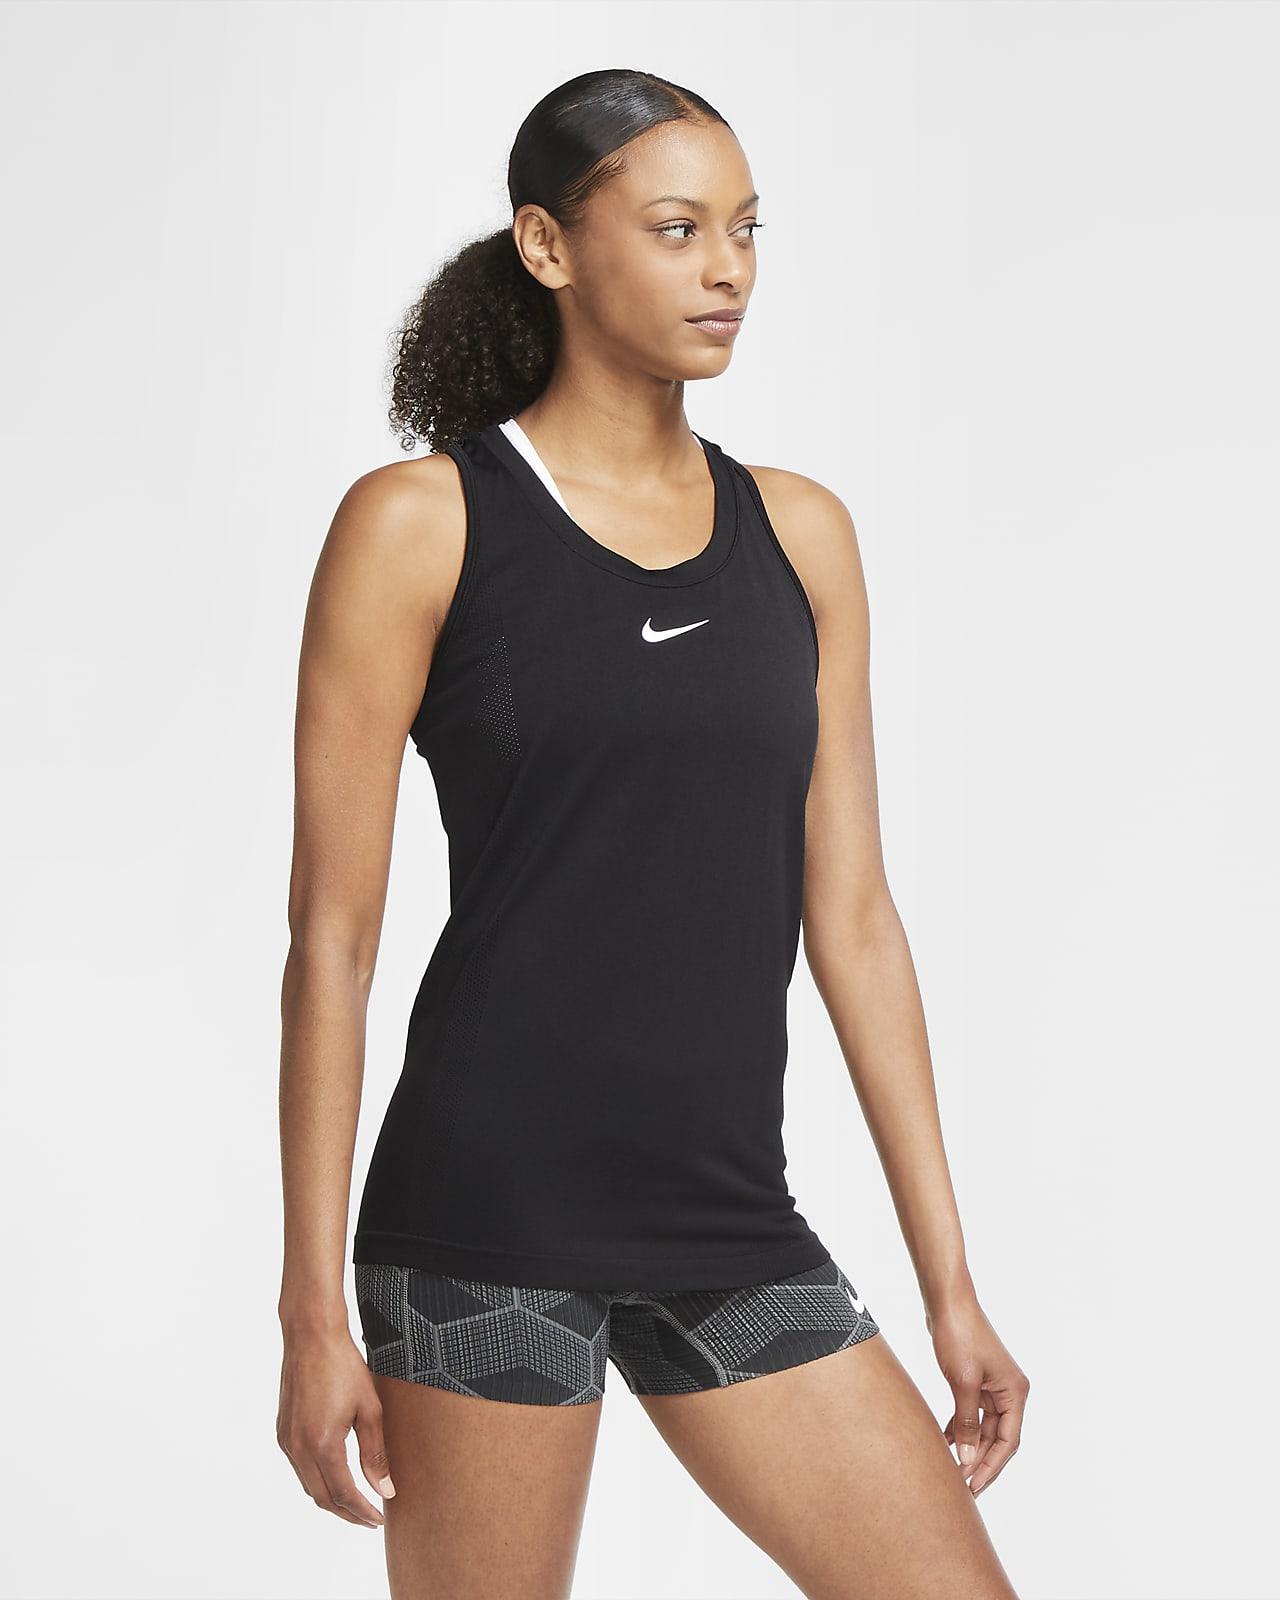 Nike Infinite Kadın Koşu Atleti